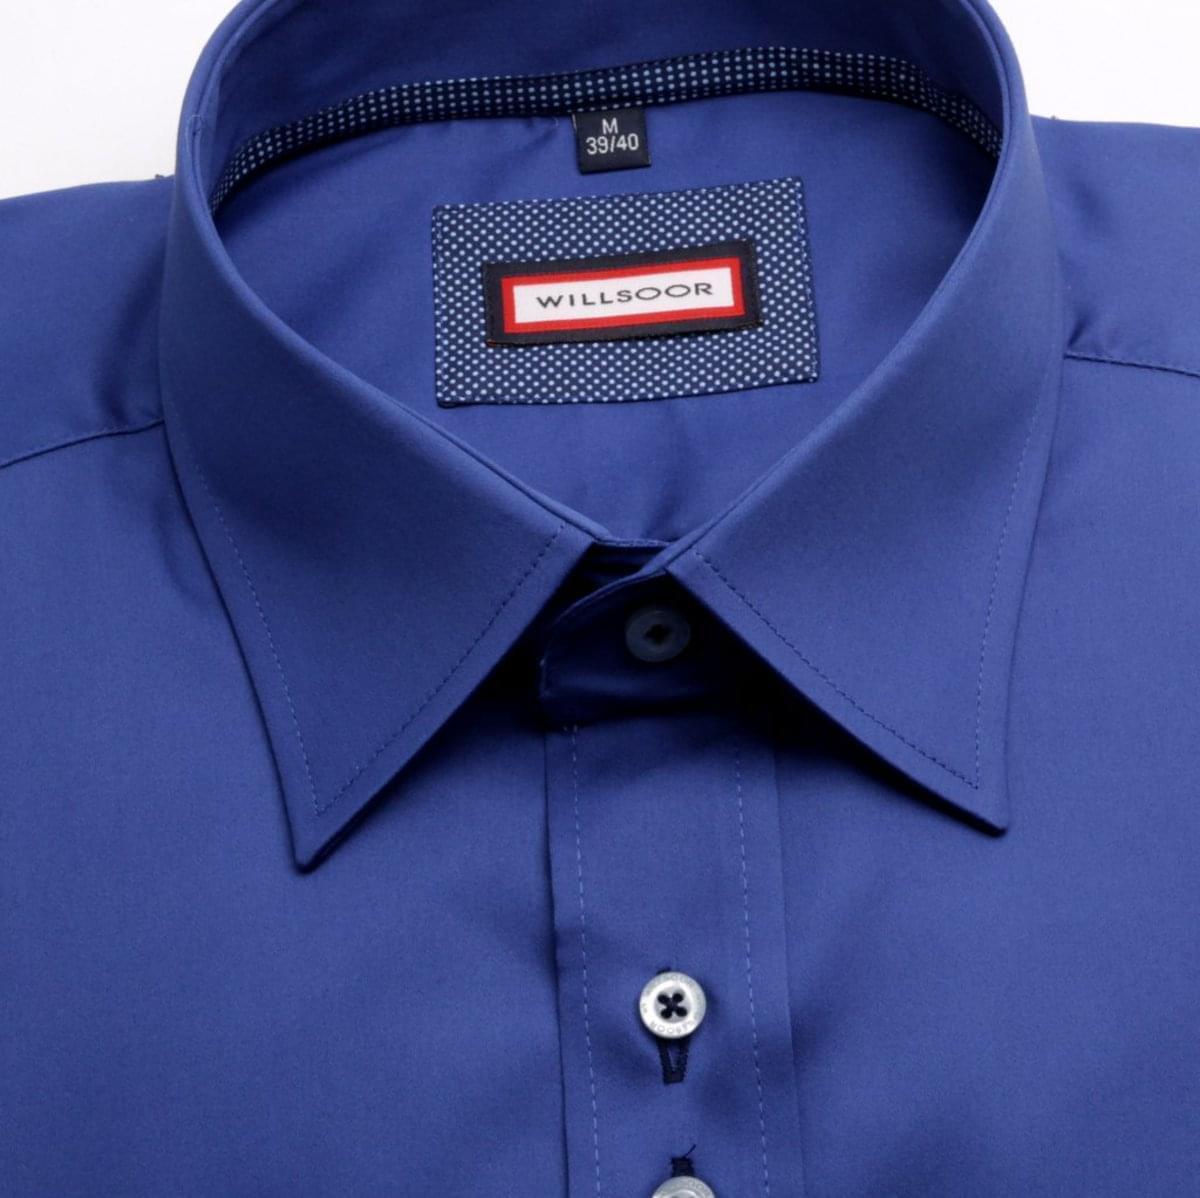 Košile WR Classic (výška 176-182) 4453 176-182 / XL (43/44)